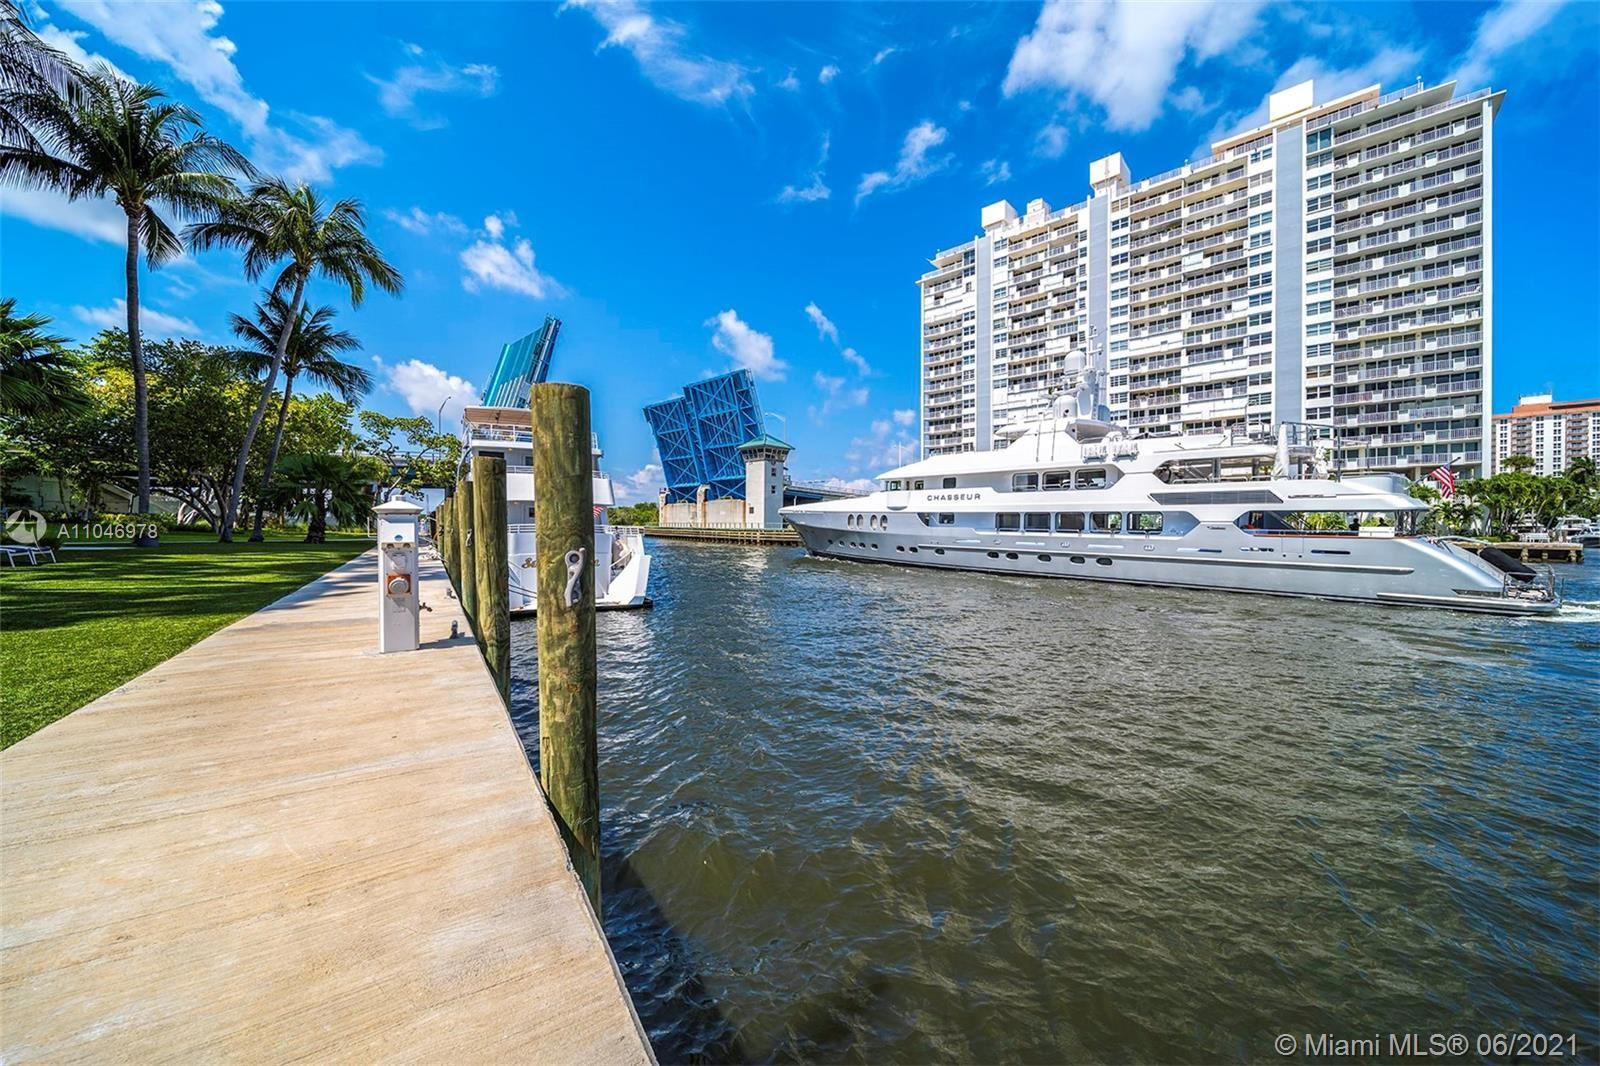 2670 E Sunrise Blvd #803, Fort Lauderdale, FL 33304 - #: A11046978